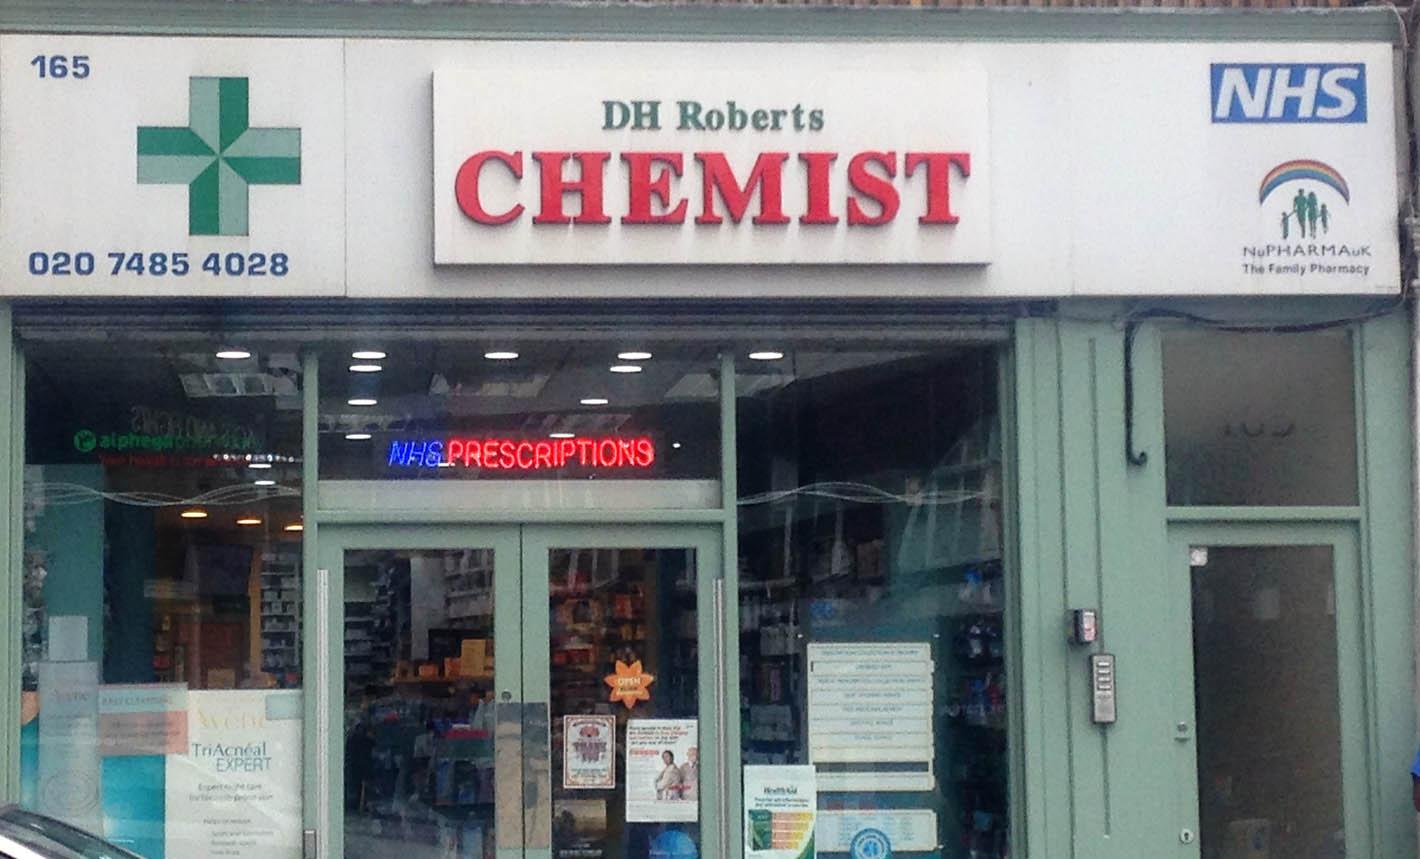 DH Roberts Chemist